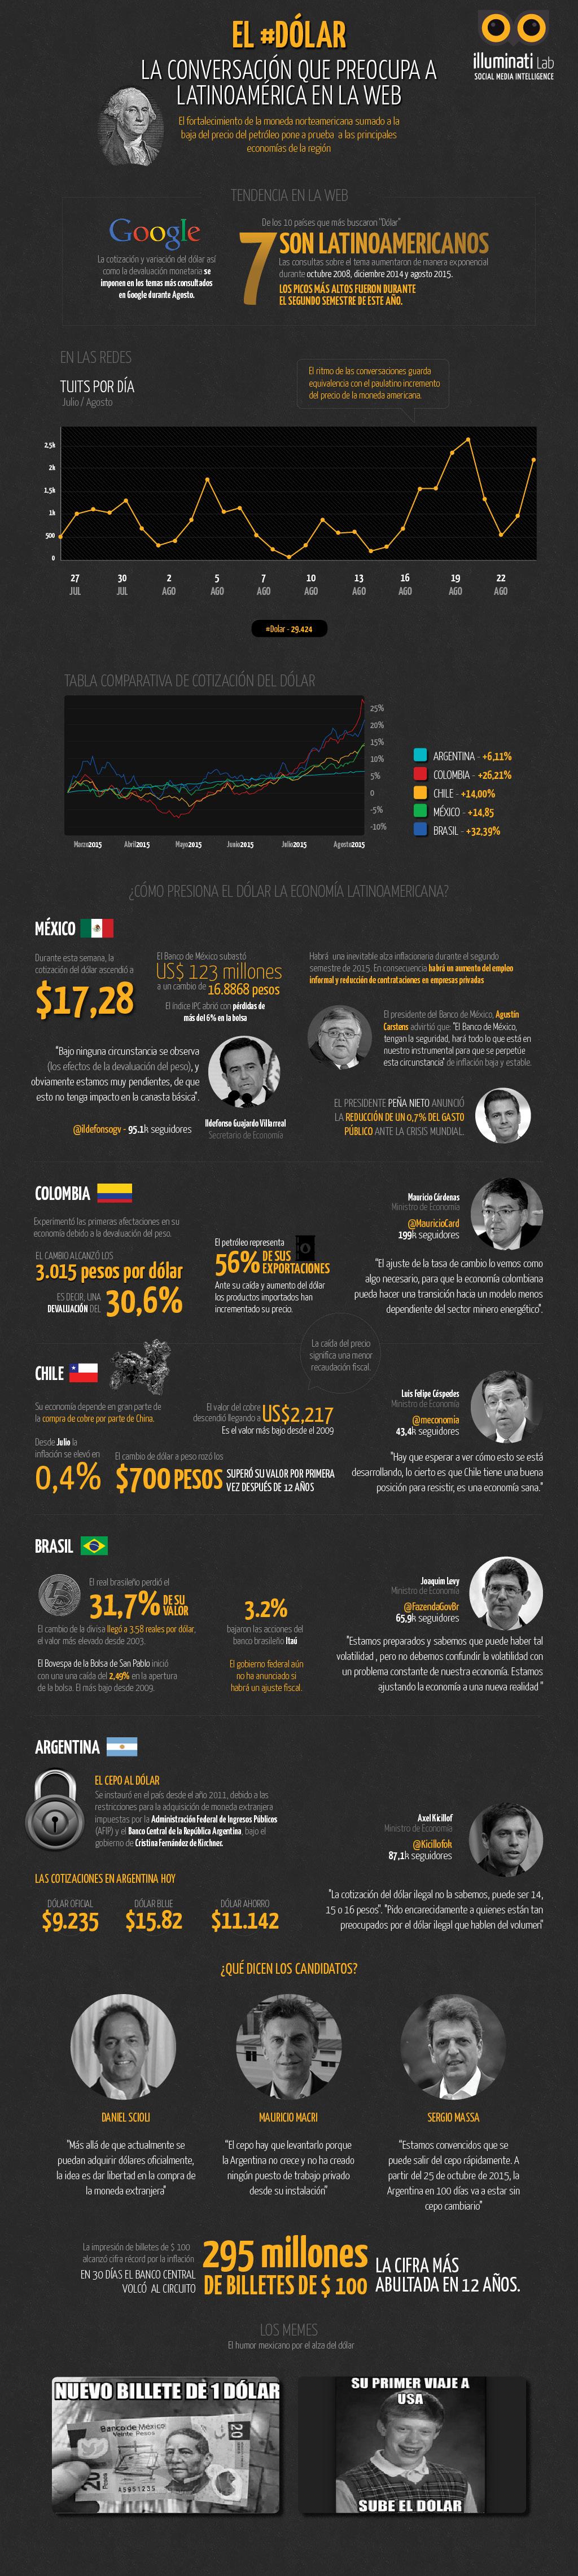 info_dolar